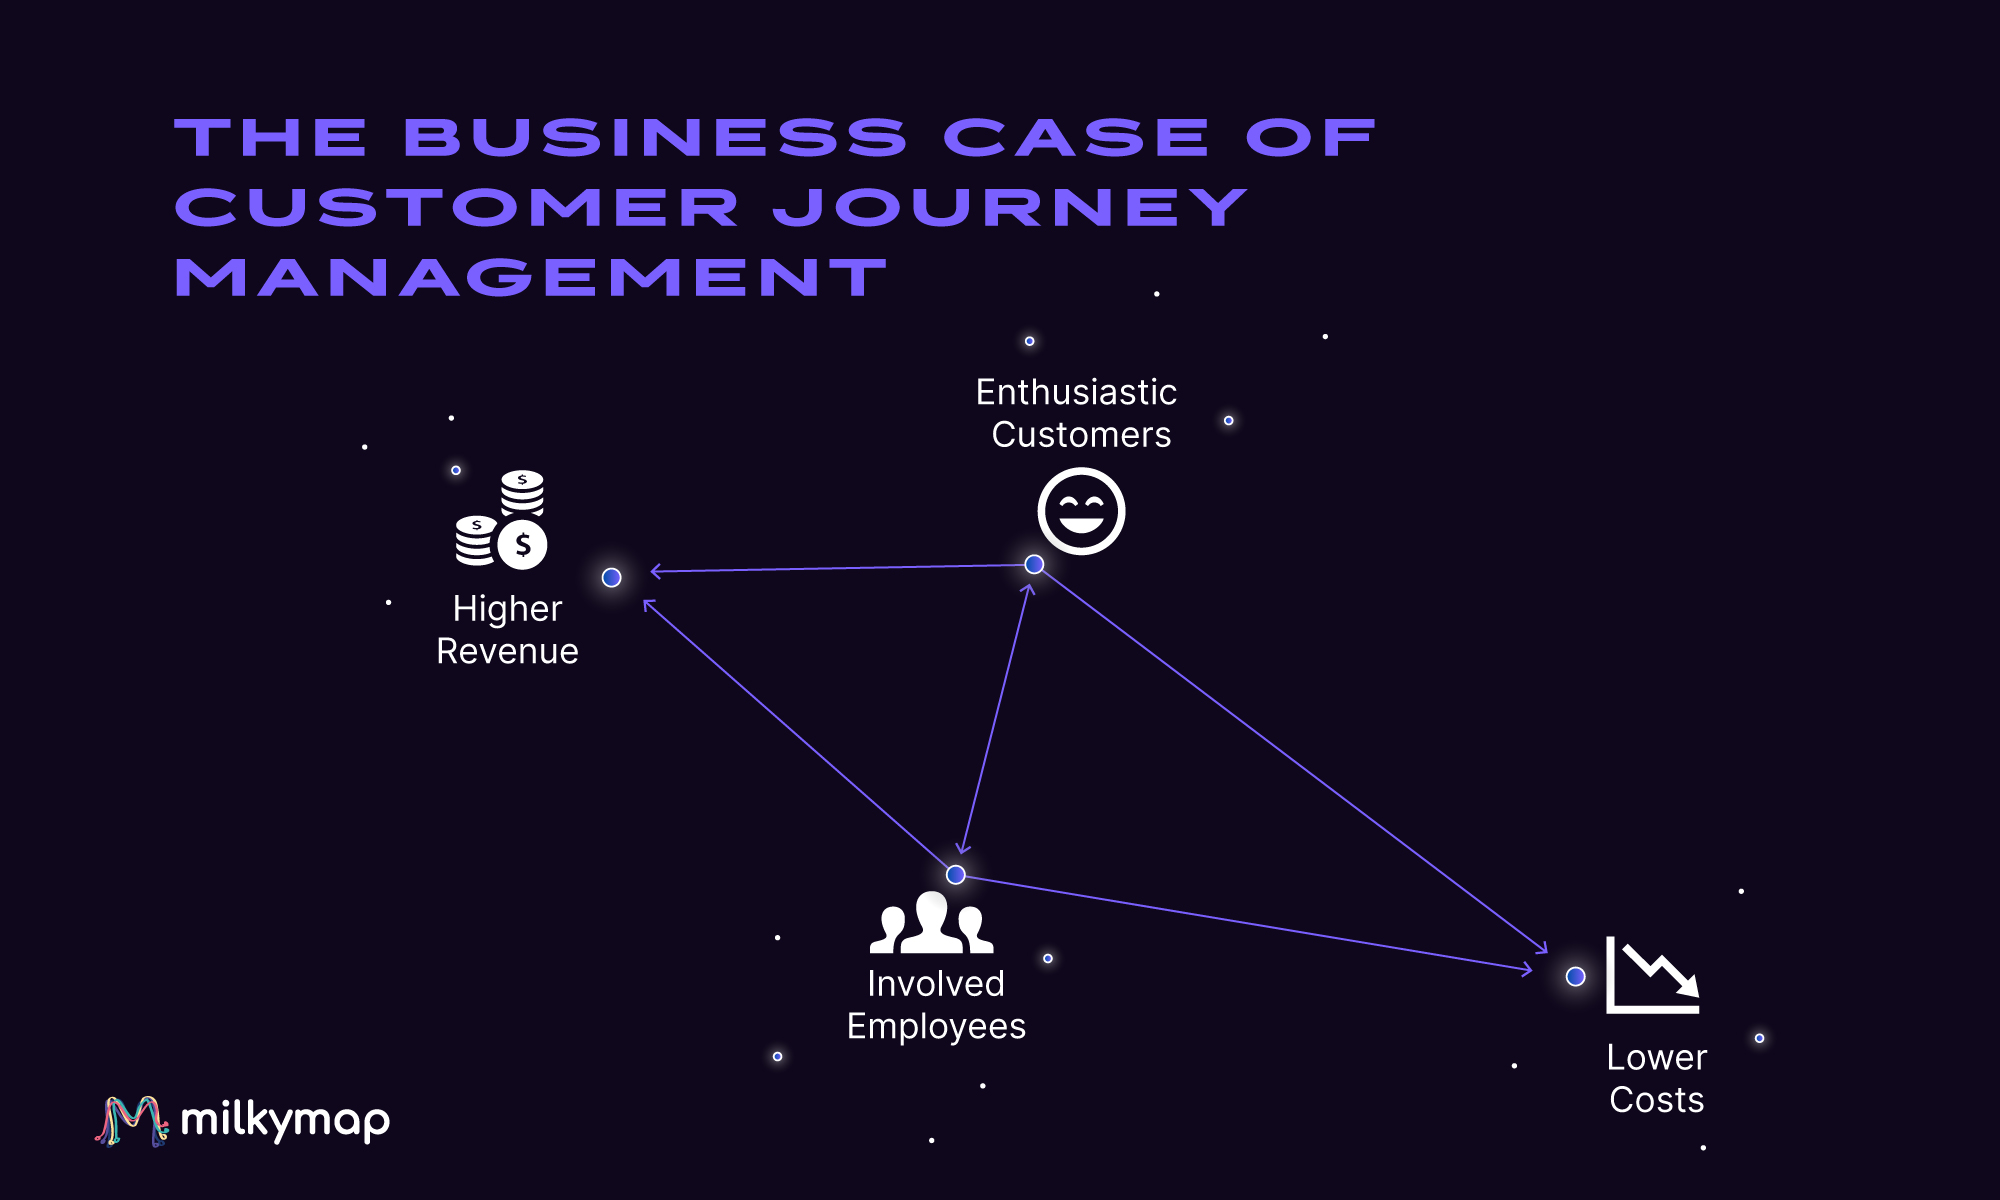 ROI of Customer Journey Management